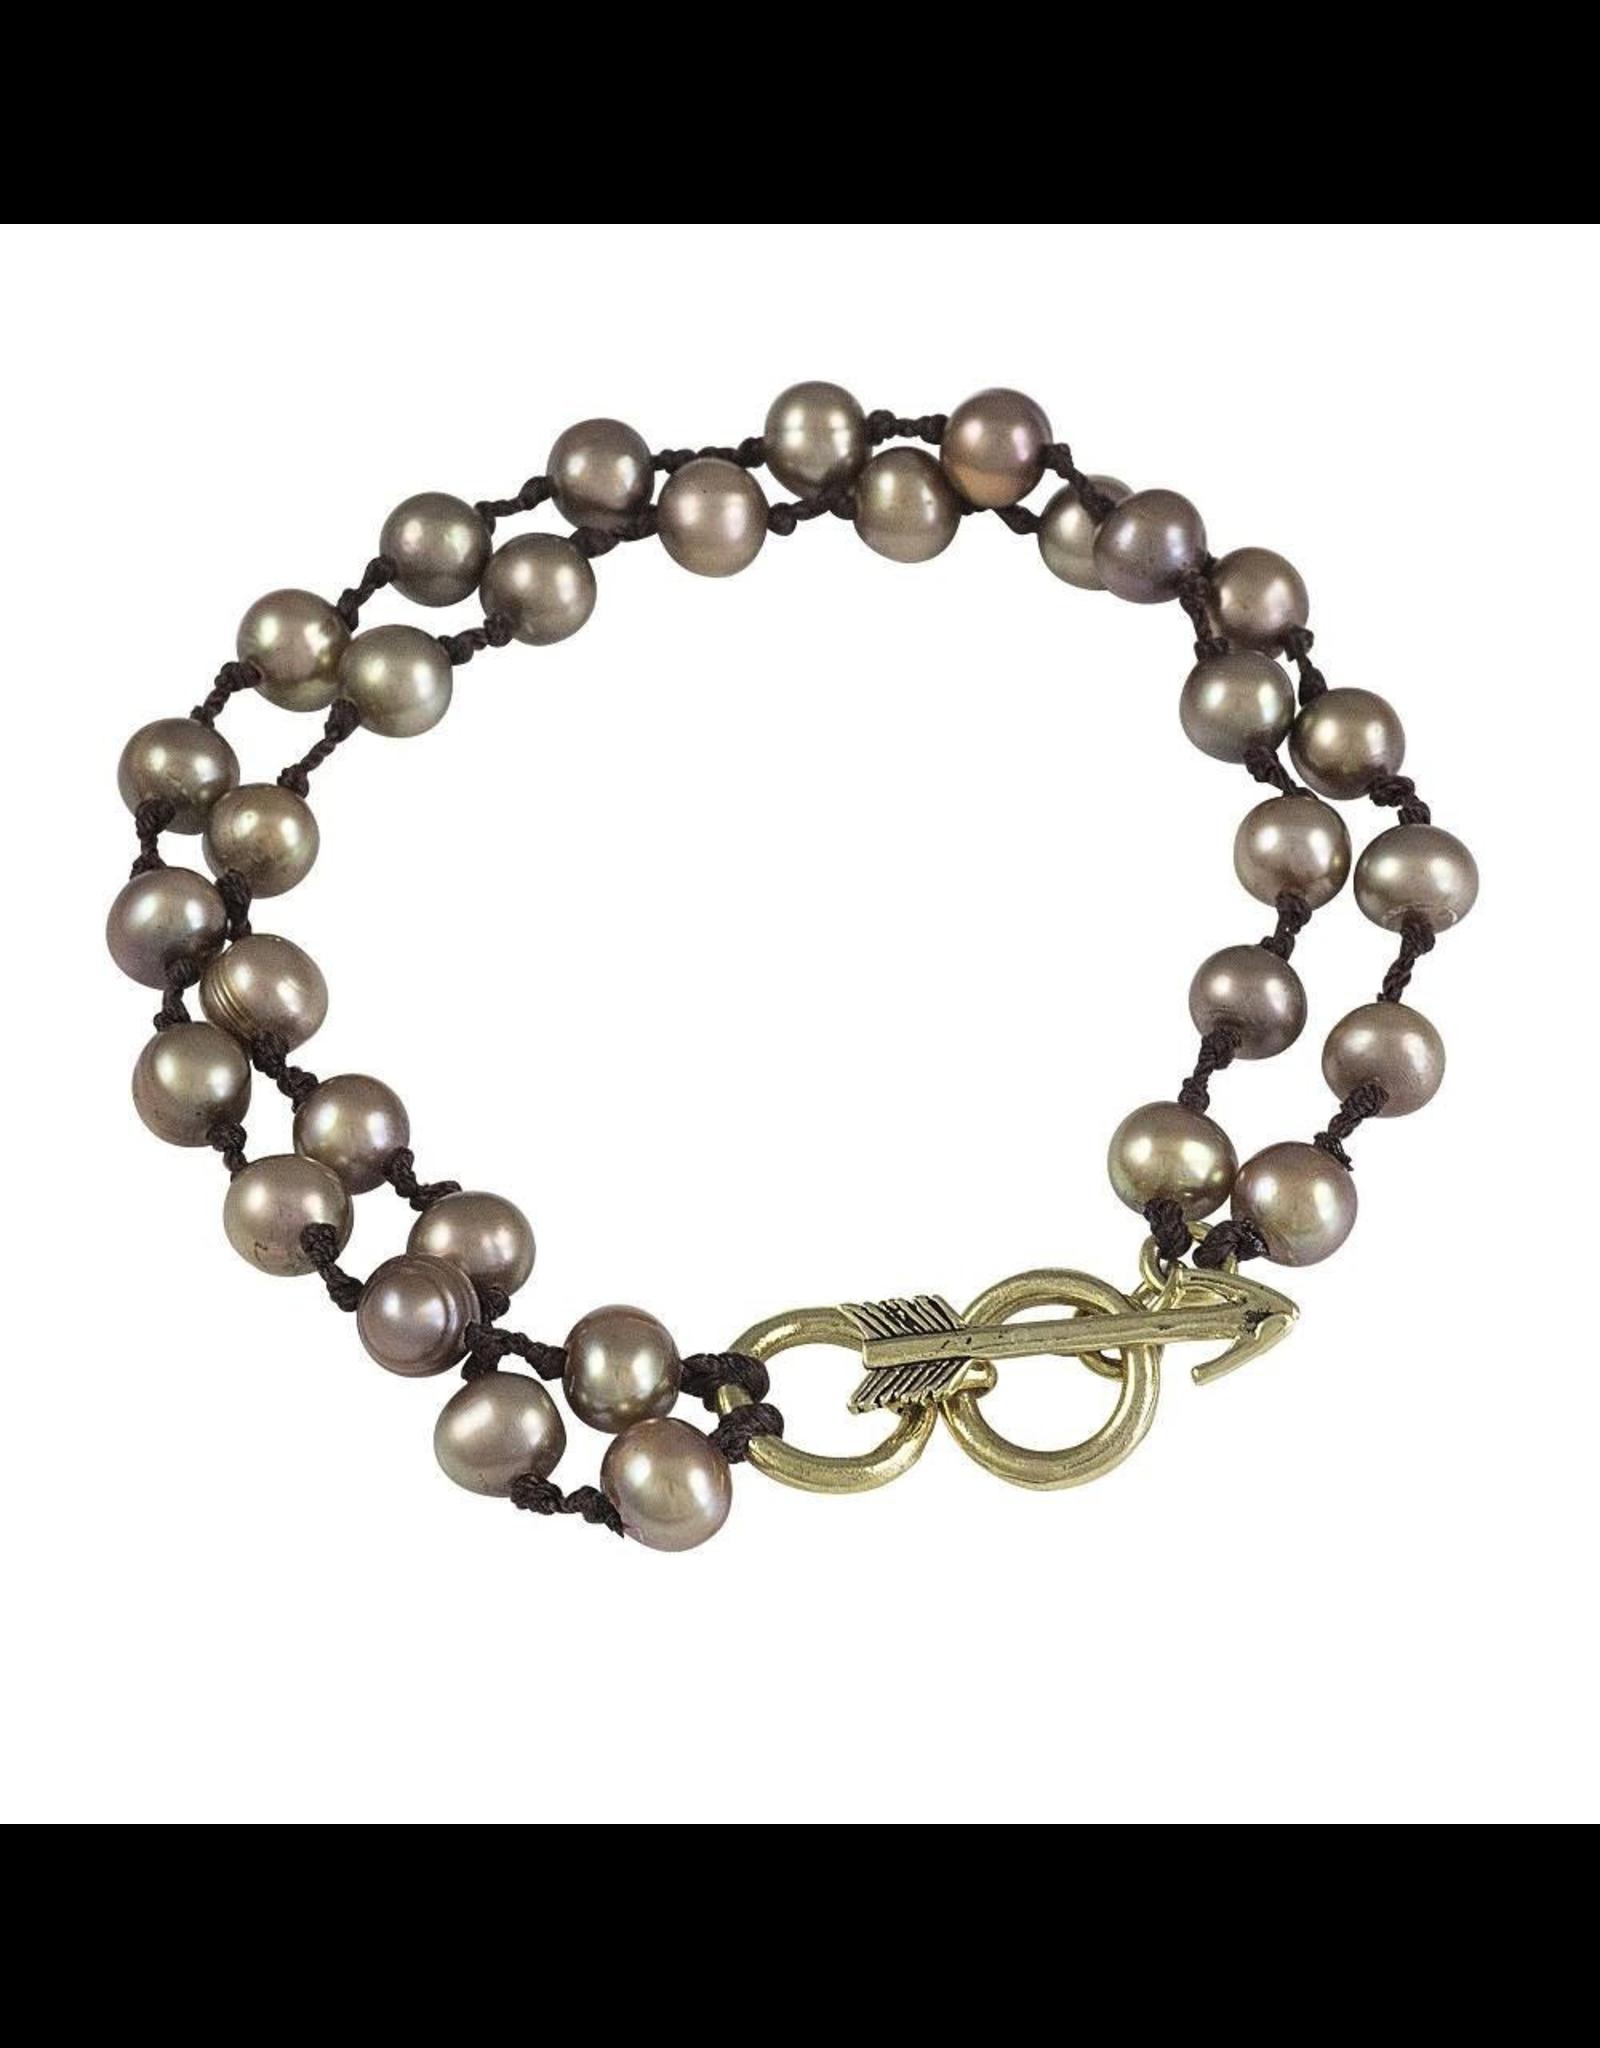 Waxing Poetic® Jewelry Boho Soul Bracelet Taupe Brass-Pearls